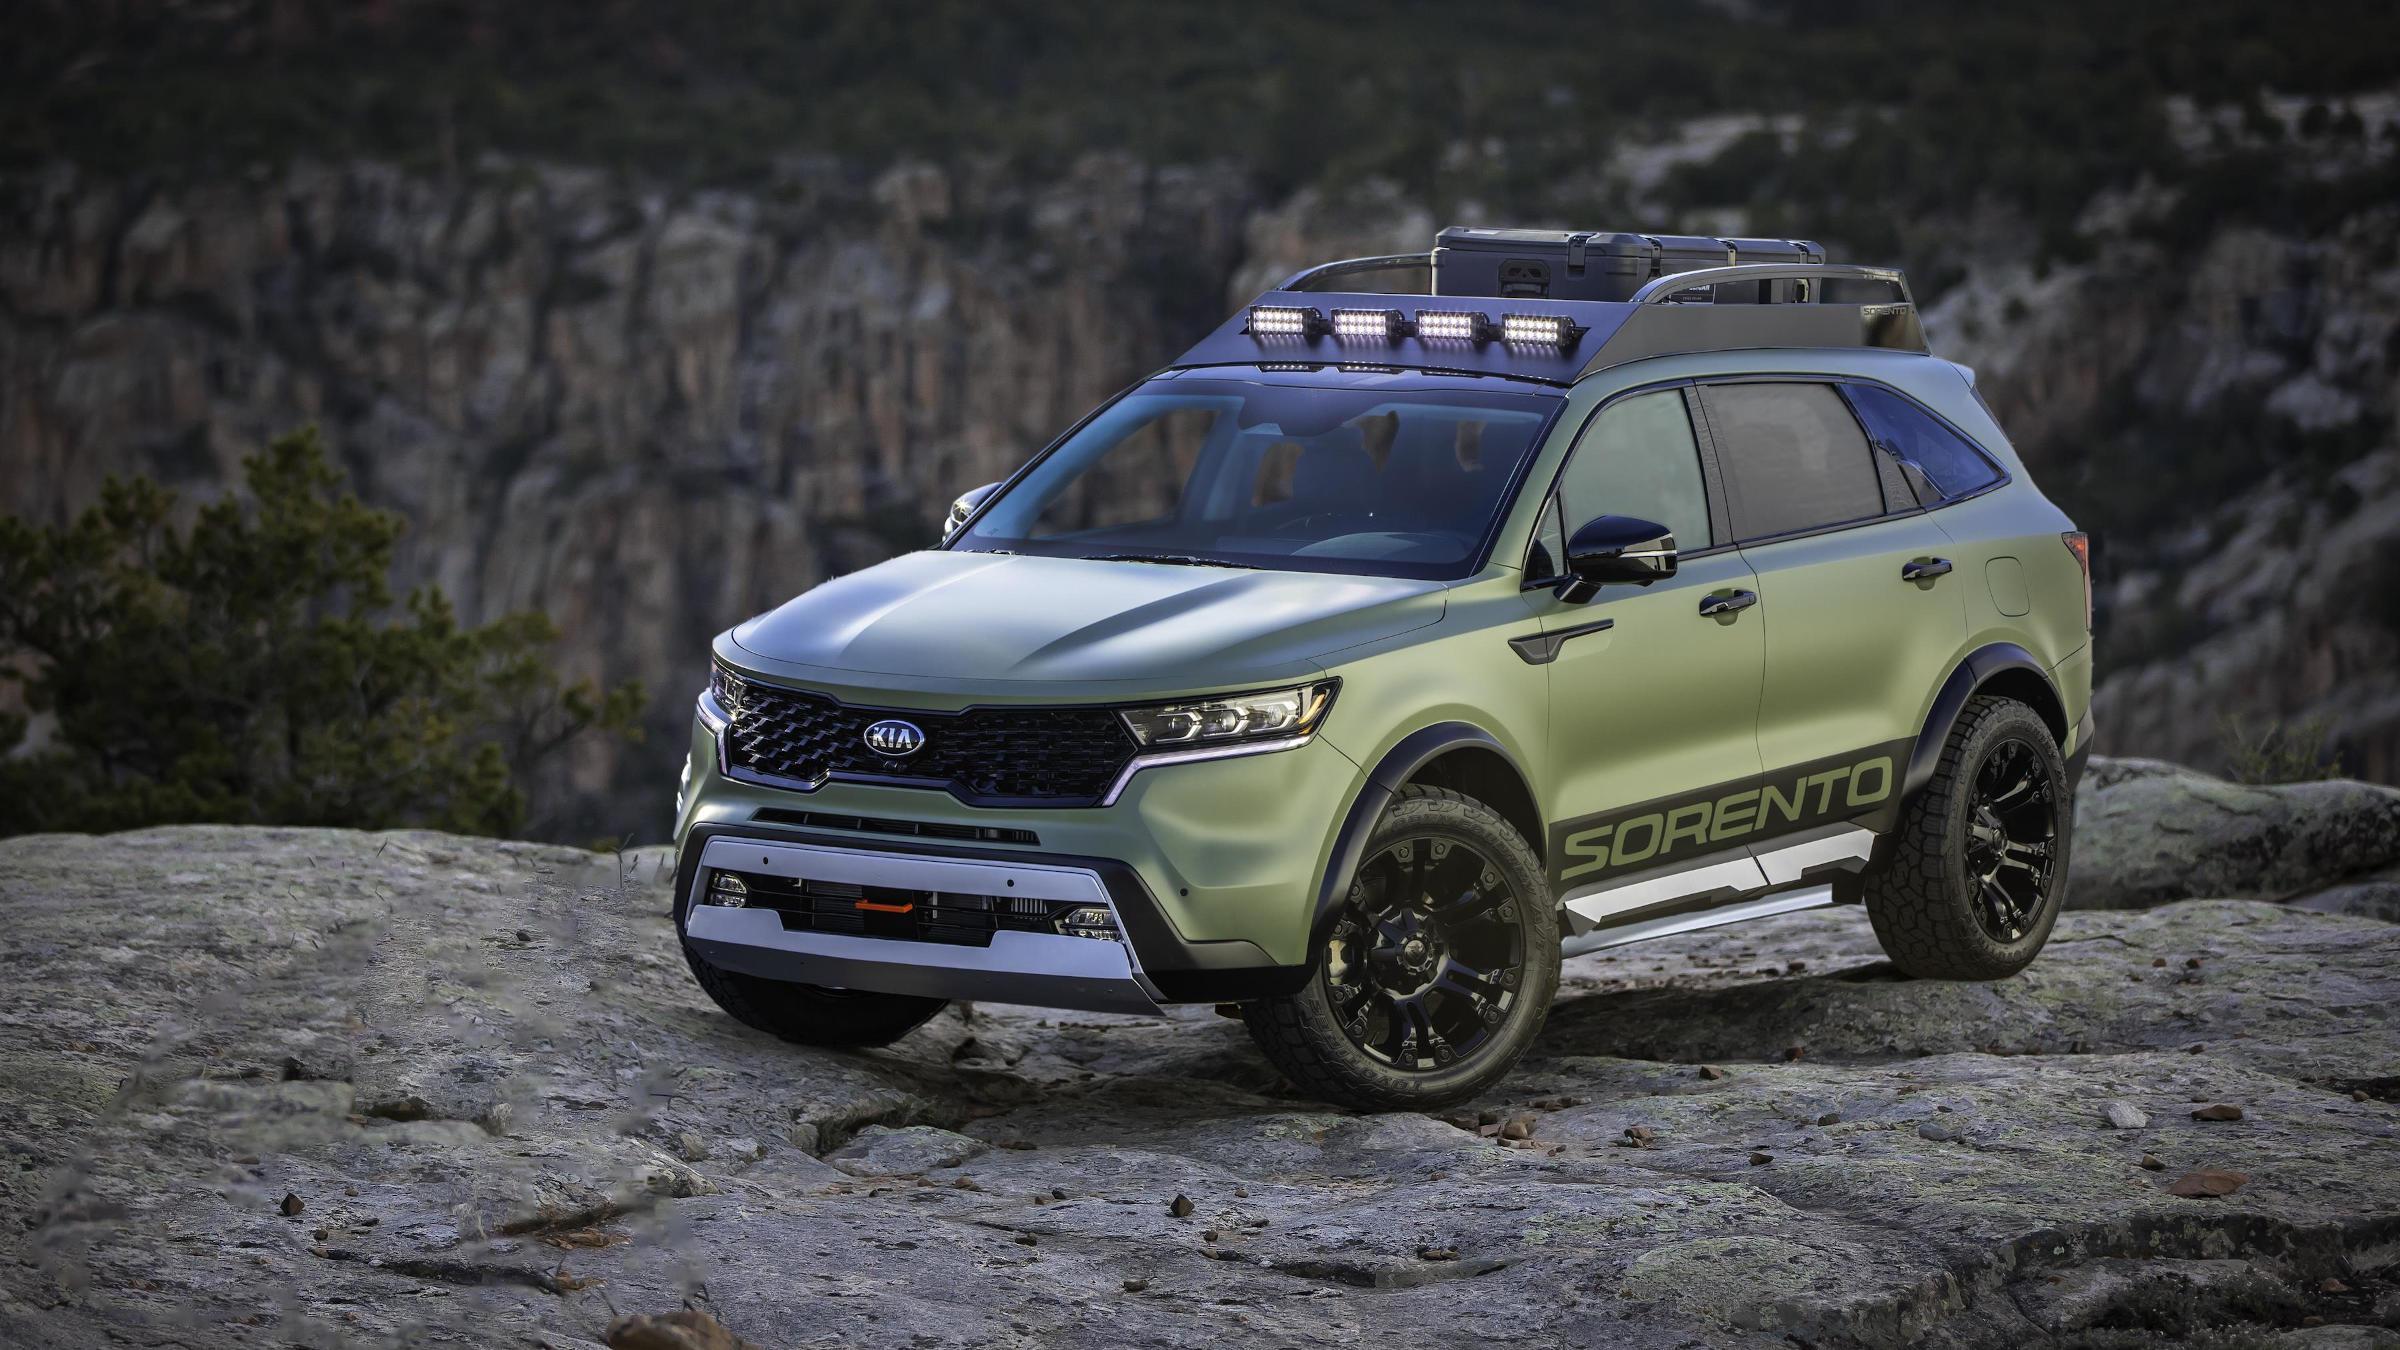 2021 Kia Sorento Yosemite Edition, Zion Edition: Specs ...